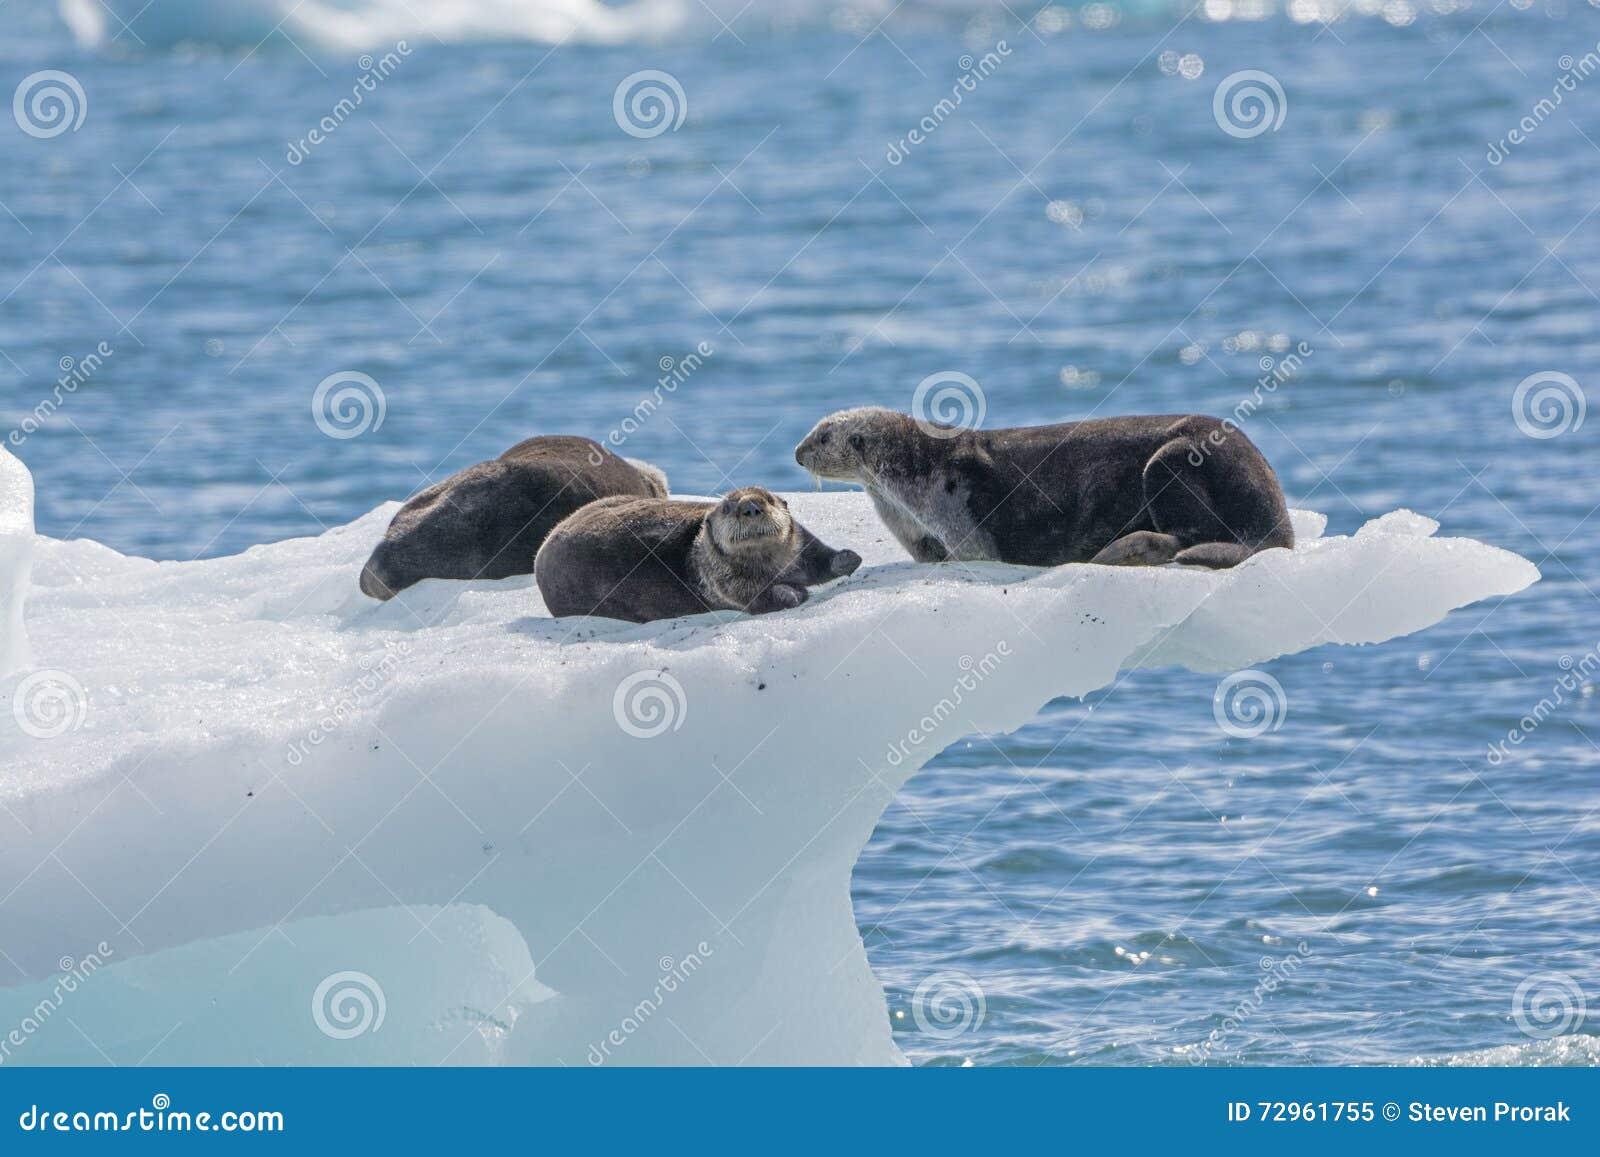 Sea Otters on an Ice Berg